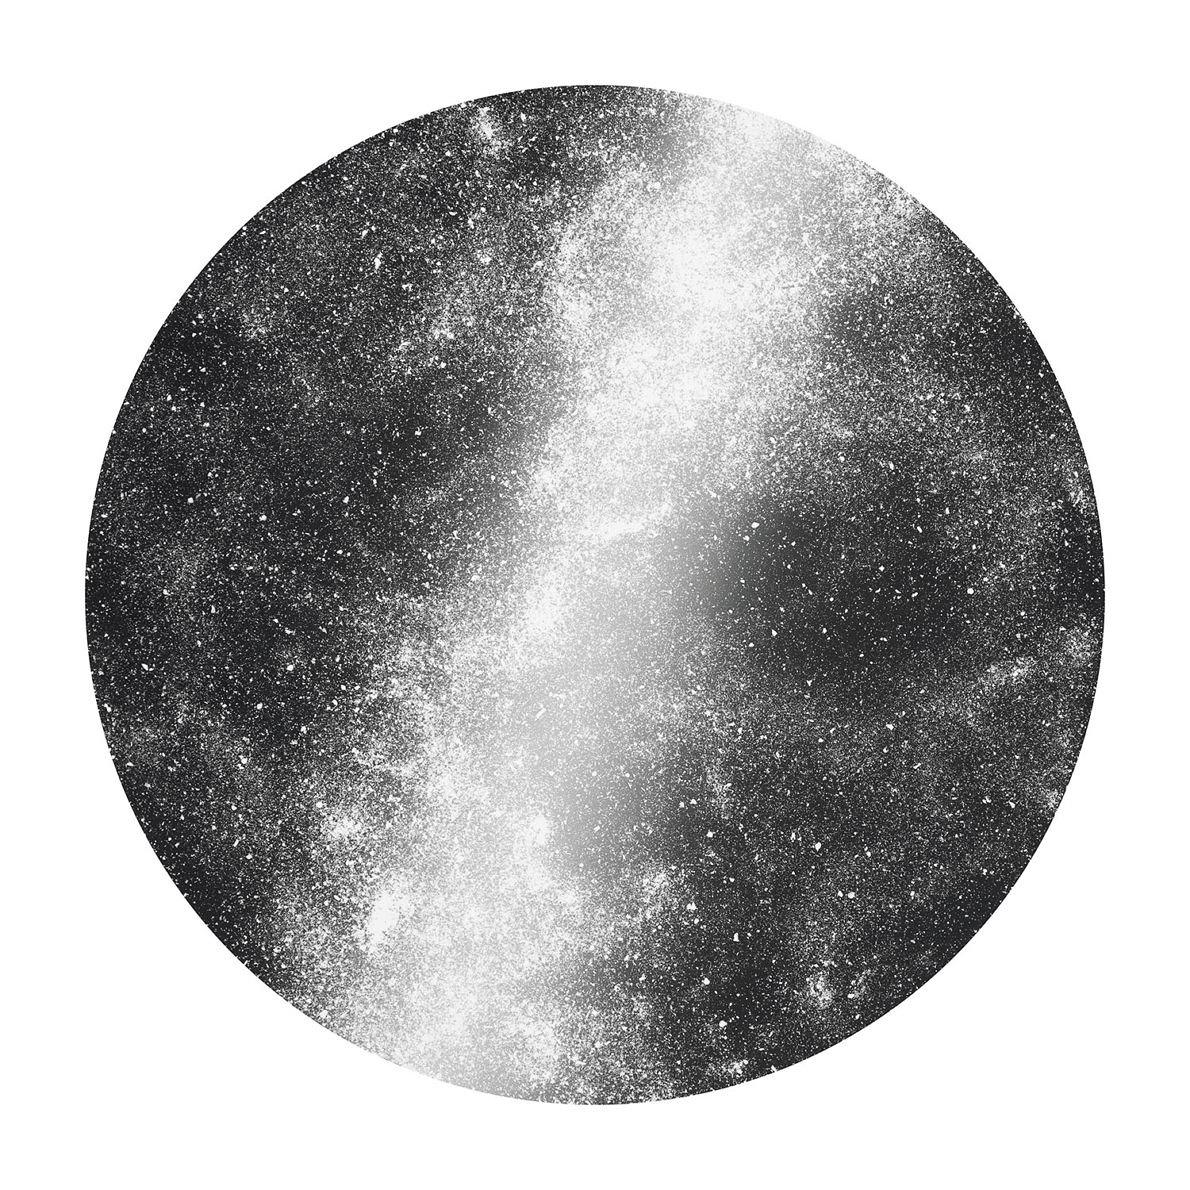 Made of Stars - Alan Knox - Phases Magazine